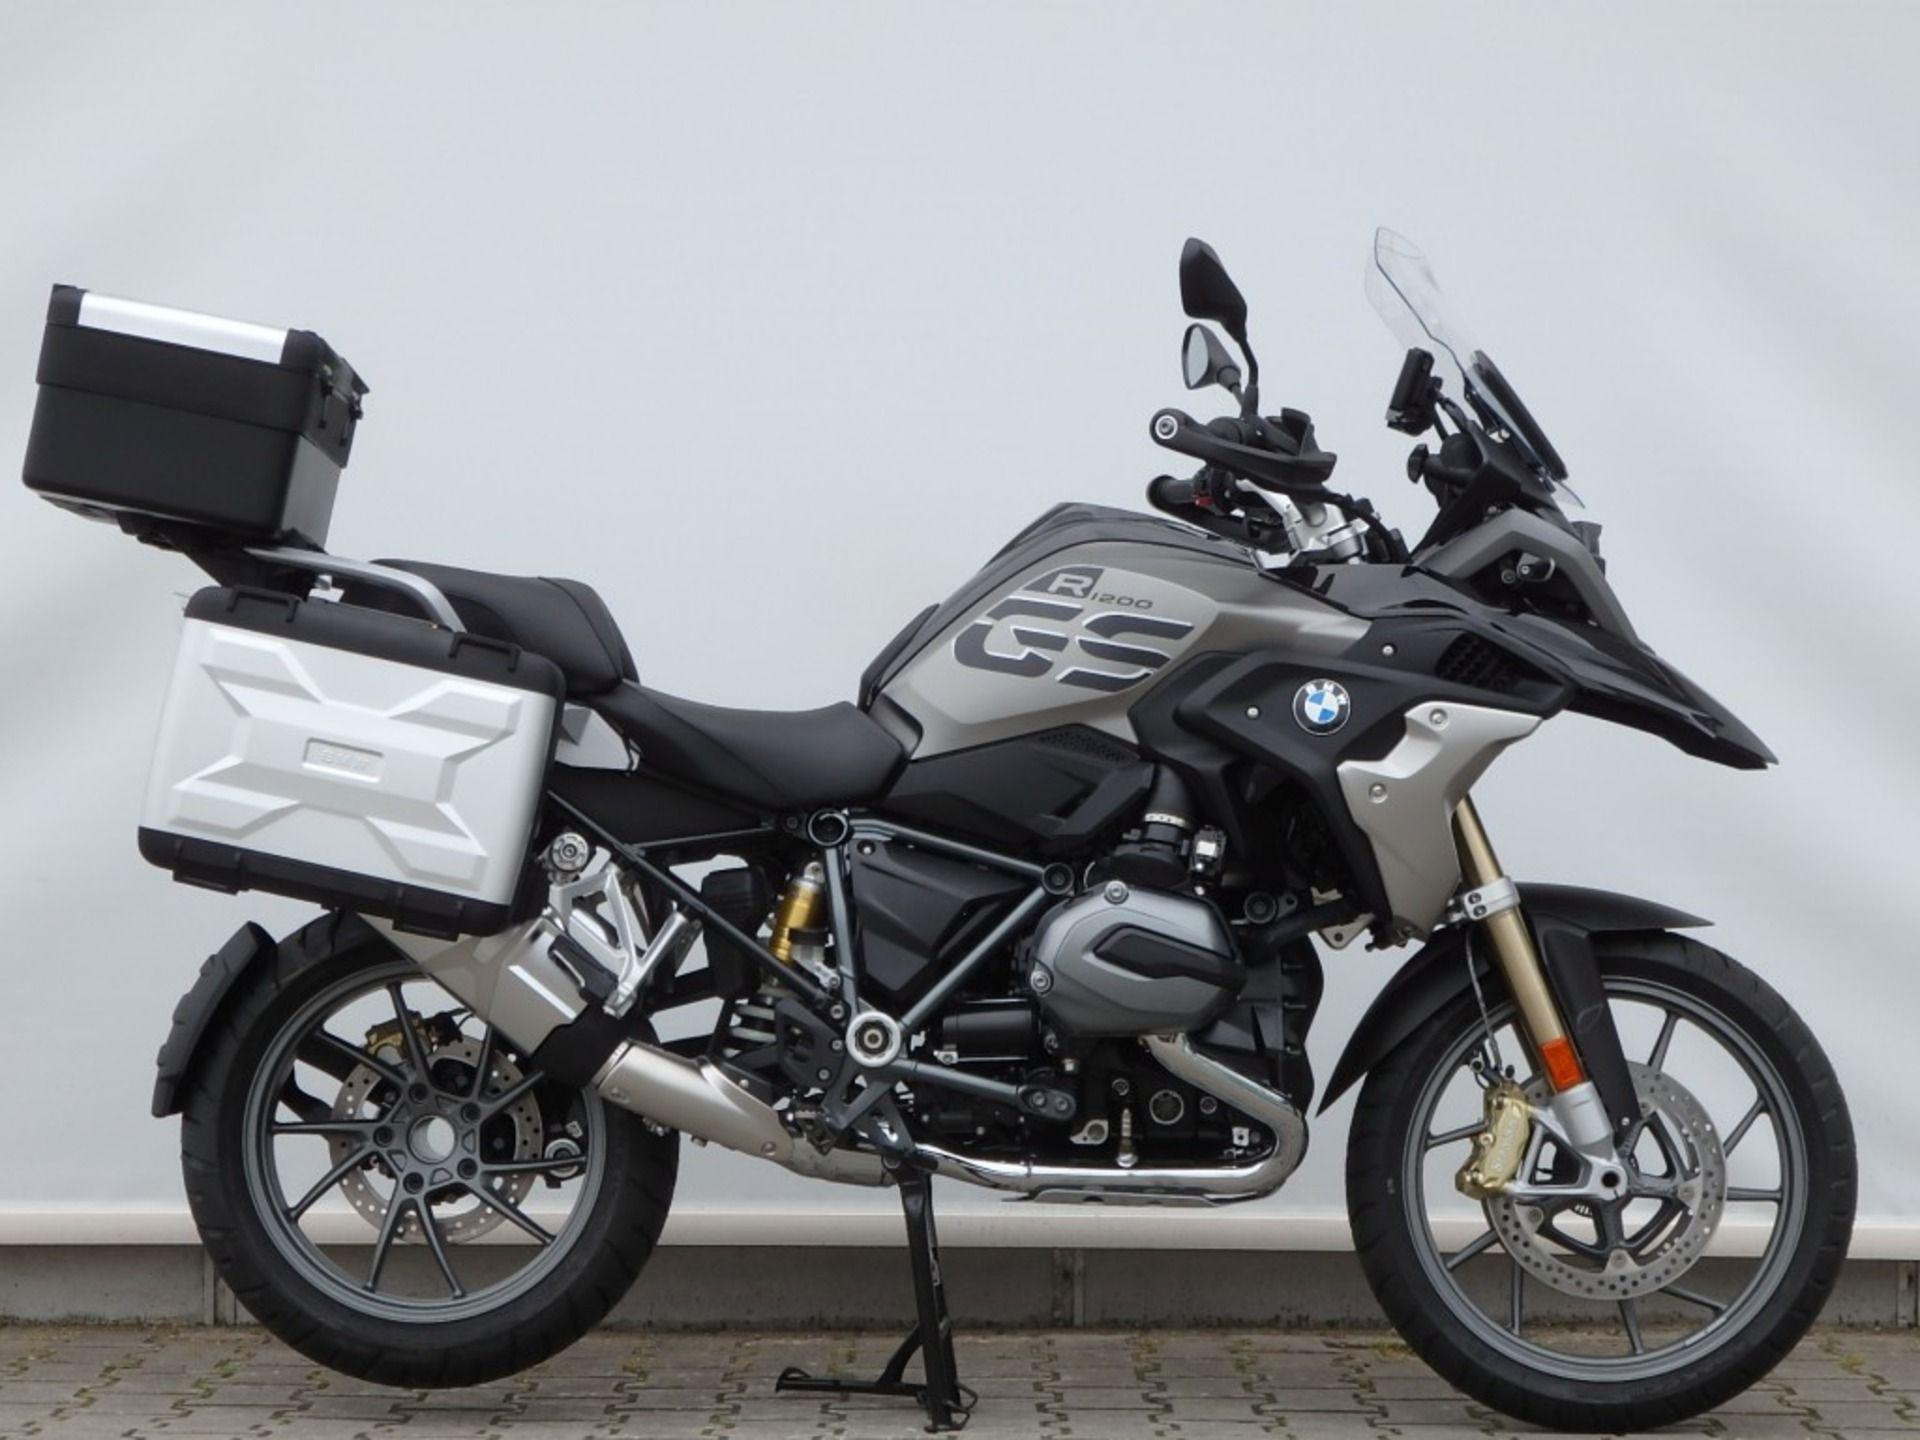 Bmw R 1200 Gs 2018 Motoroccasion Nl Motor